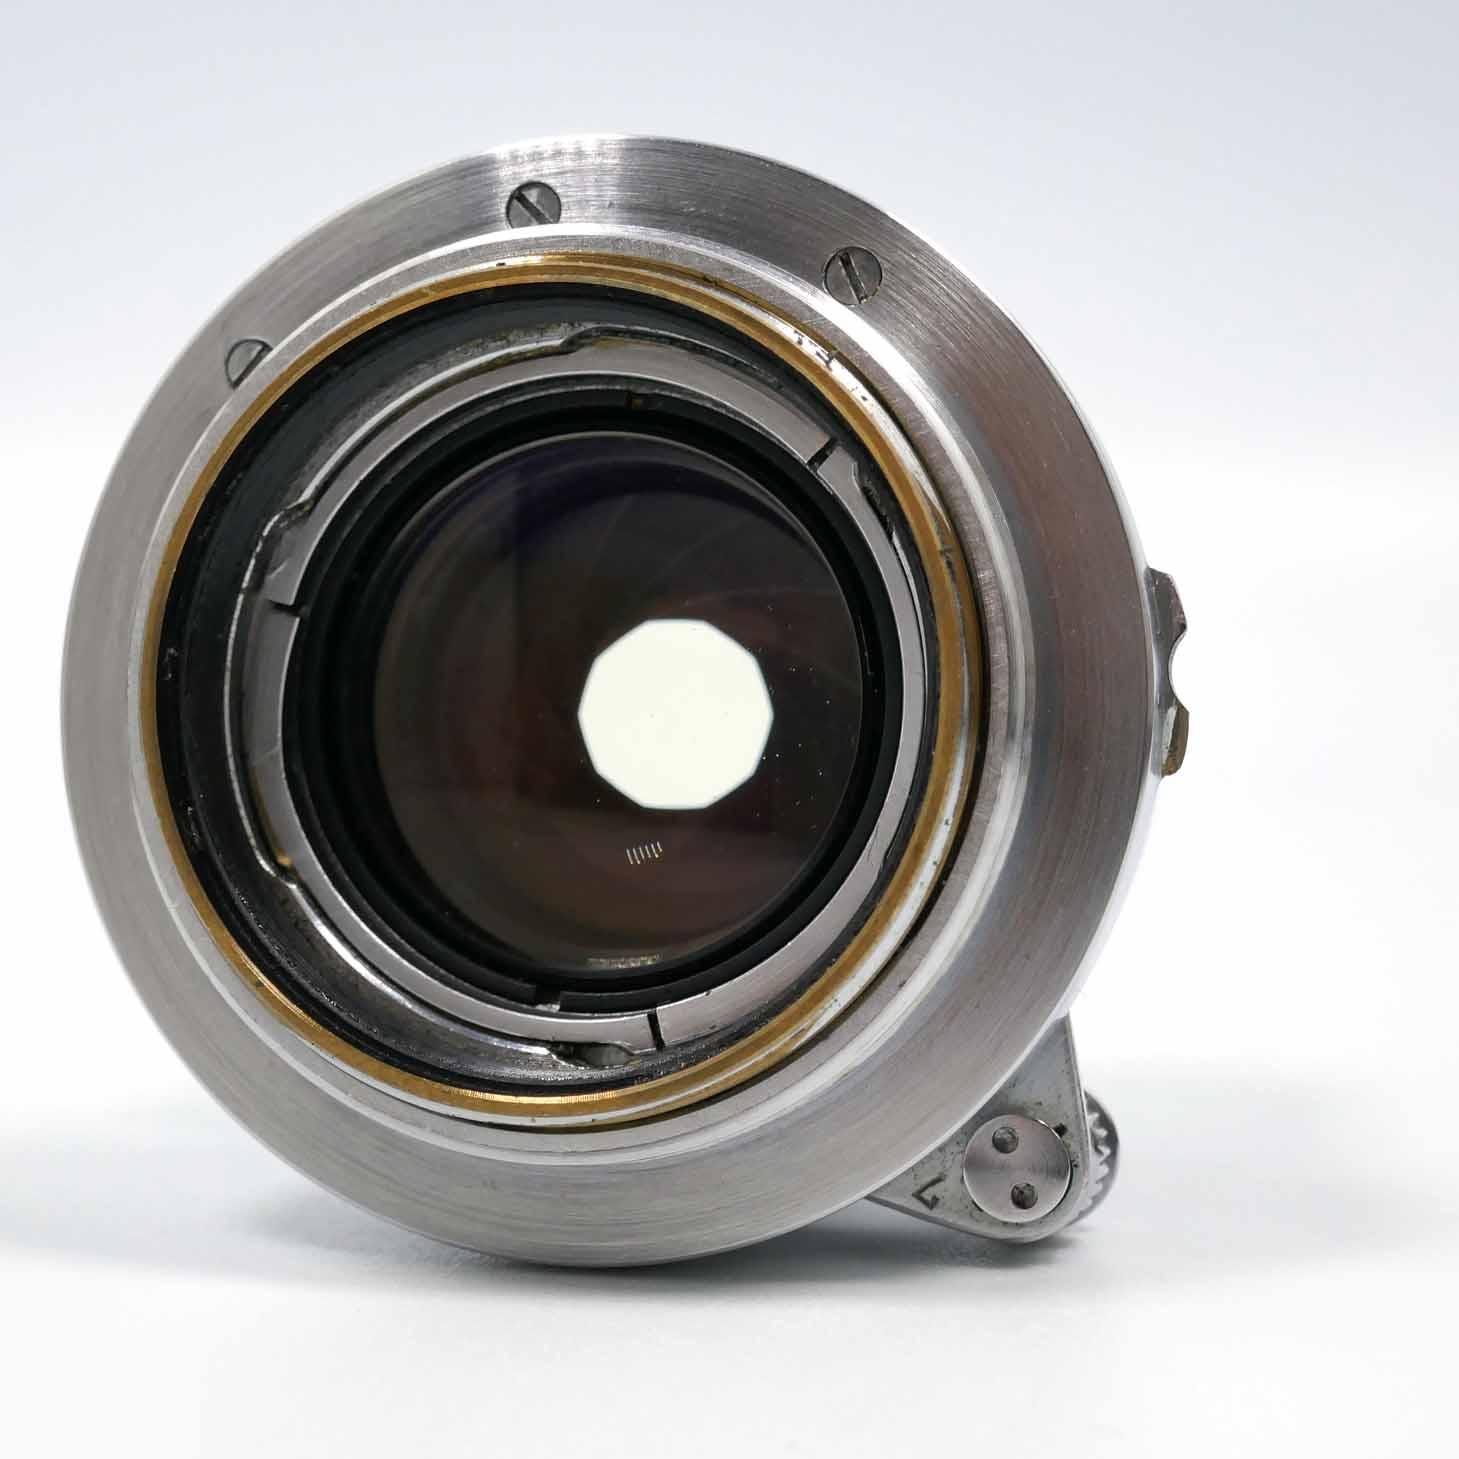 clean-cameras-Leica-IIIg+Summicron-2.0-5cm12